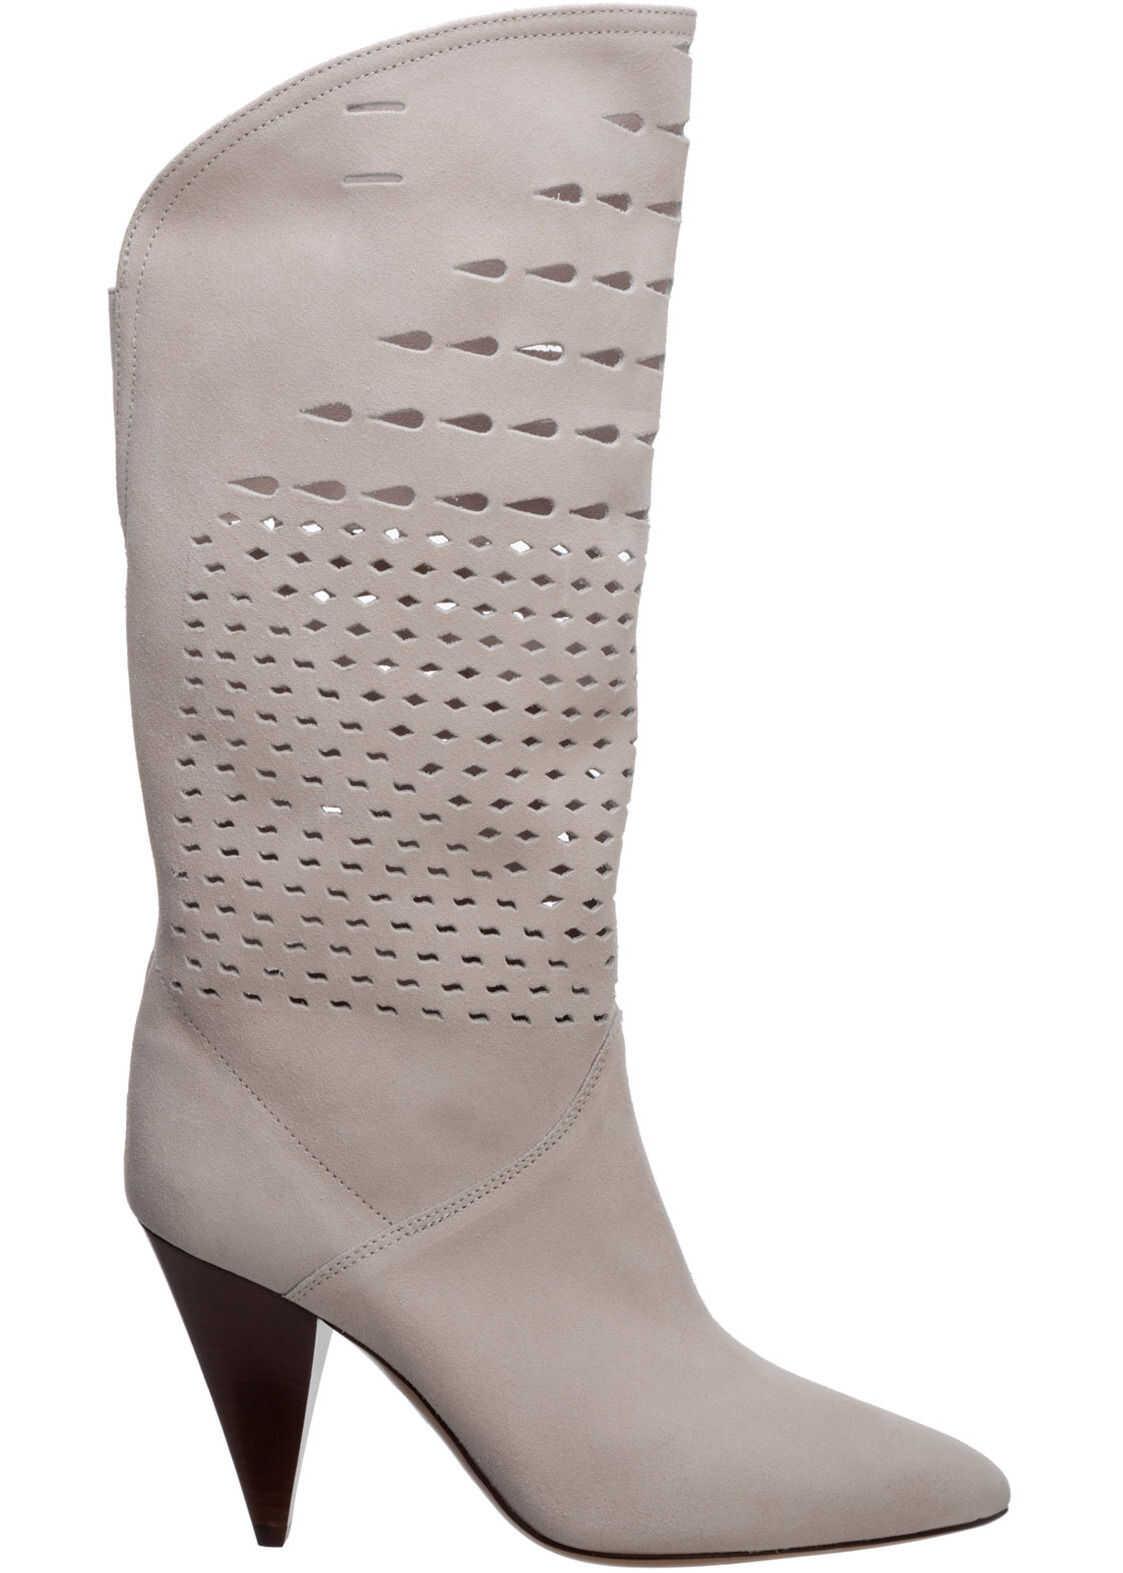 Isabel Marant Heel Boots BO029220WH White imagine b-mall.ro